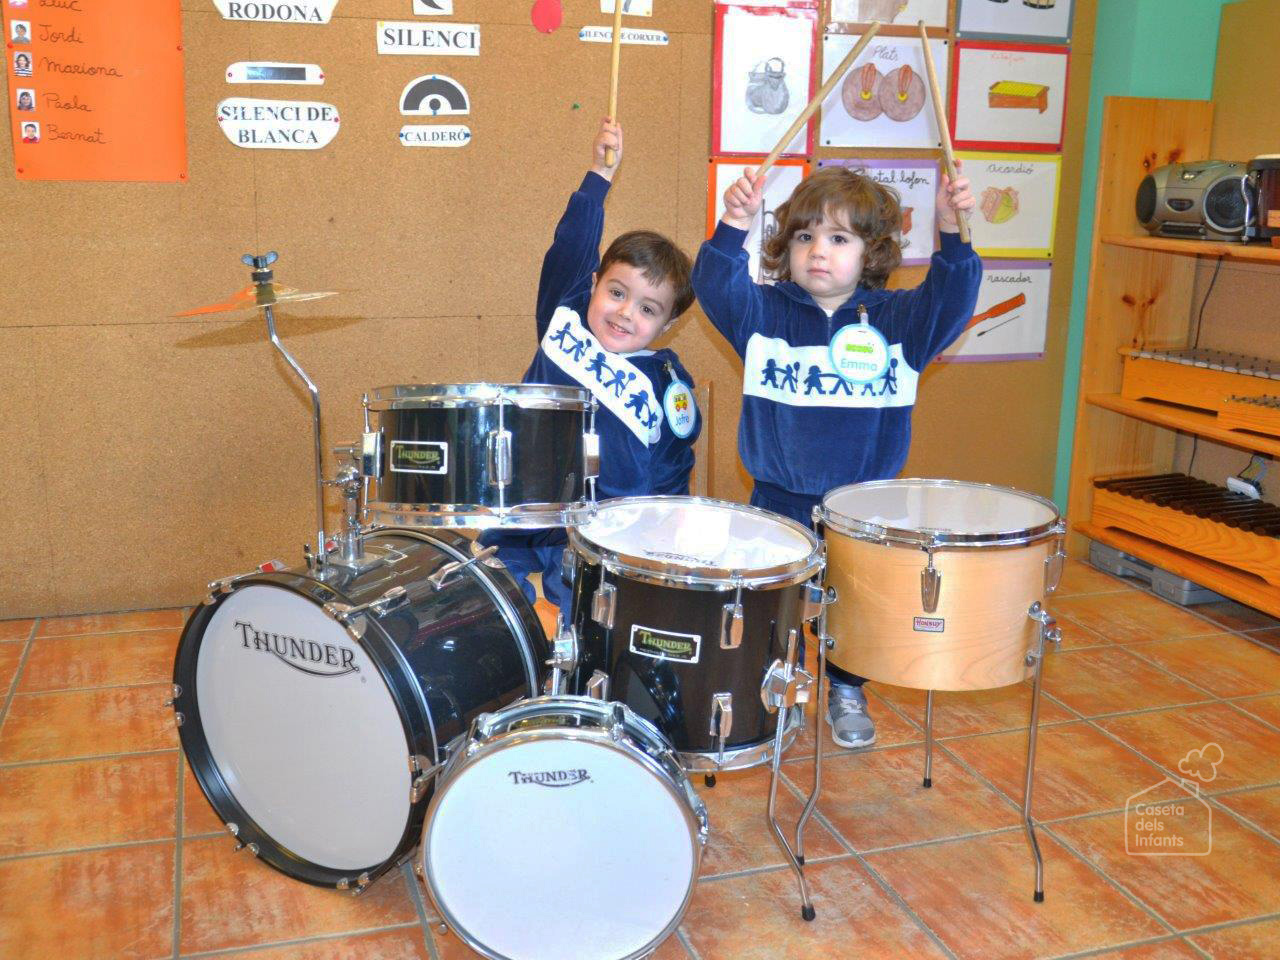 La_Caseta_dels_infants_Aula_musica_02.jpg